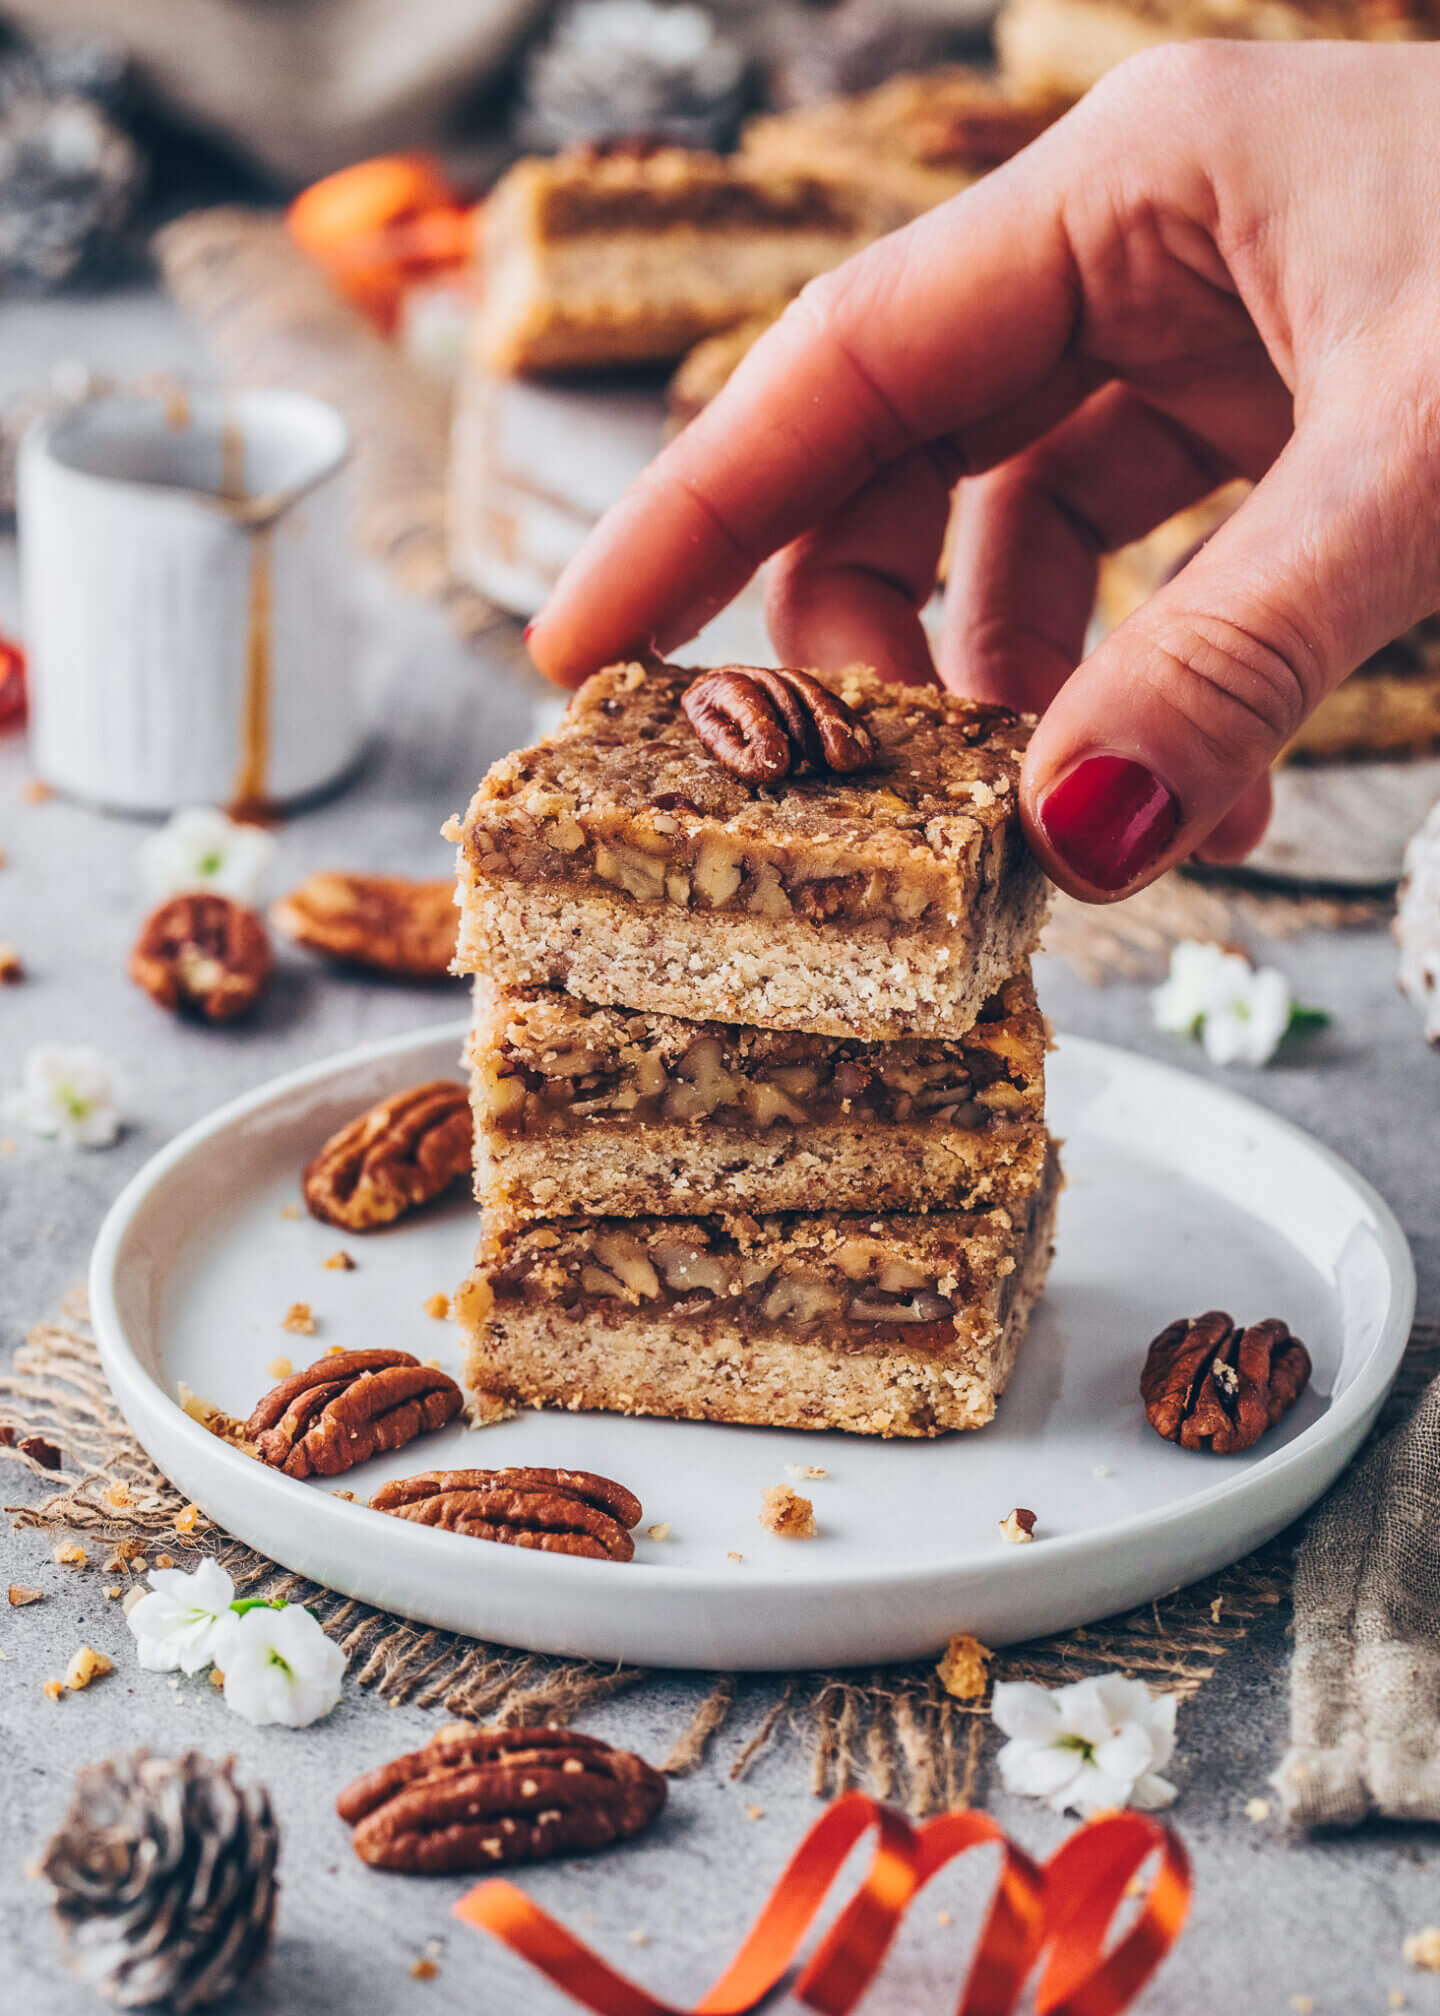 Crunchy Nuss-Riegel mit Krokant